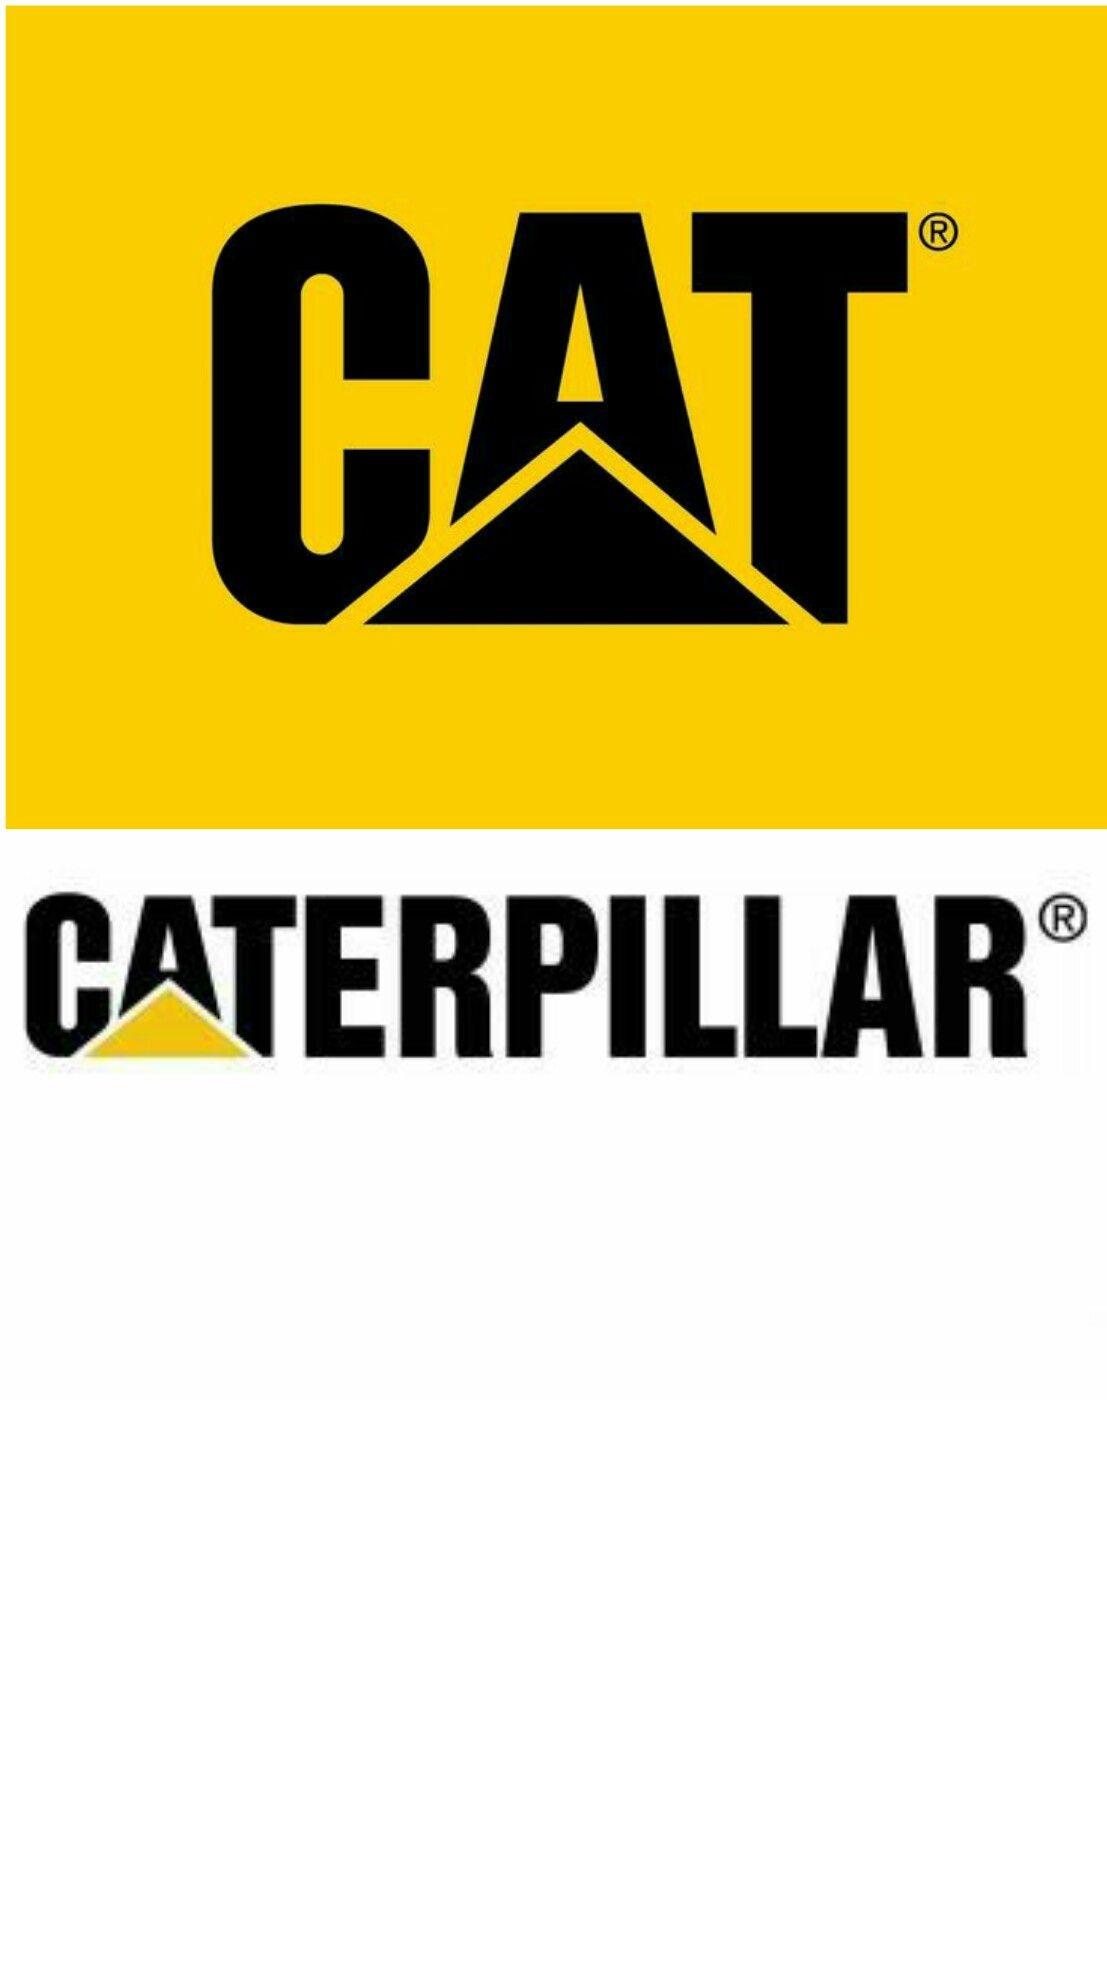 Cars Caterpillar Black Wallpaper Android Iphone